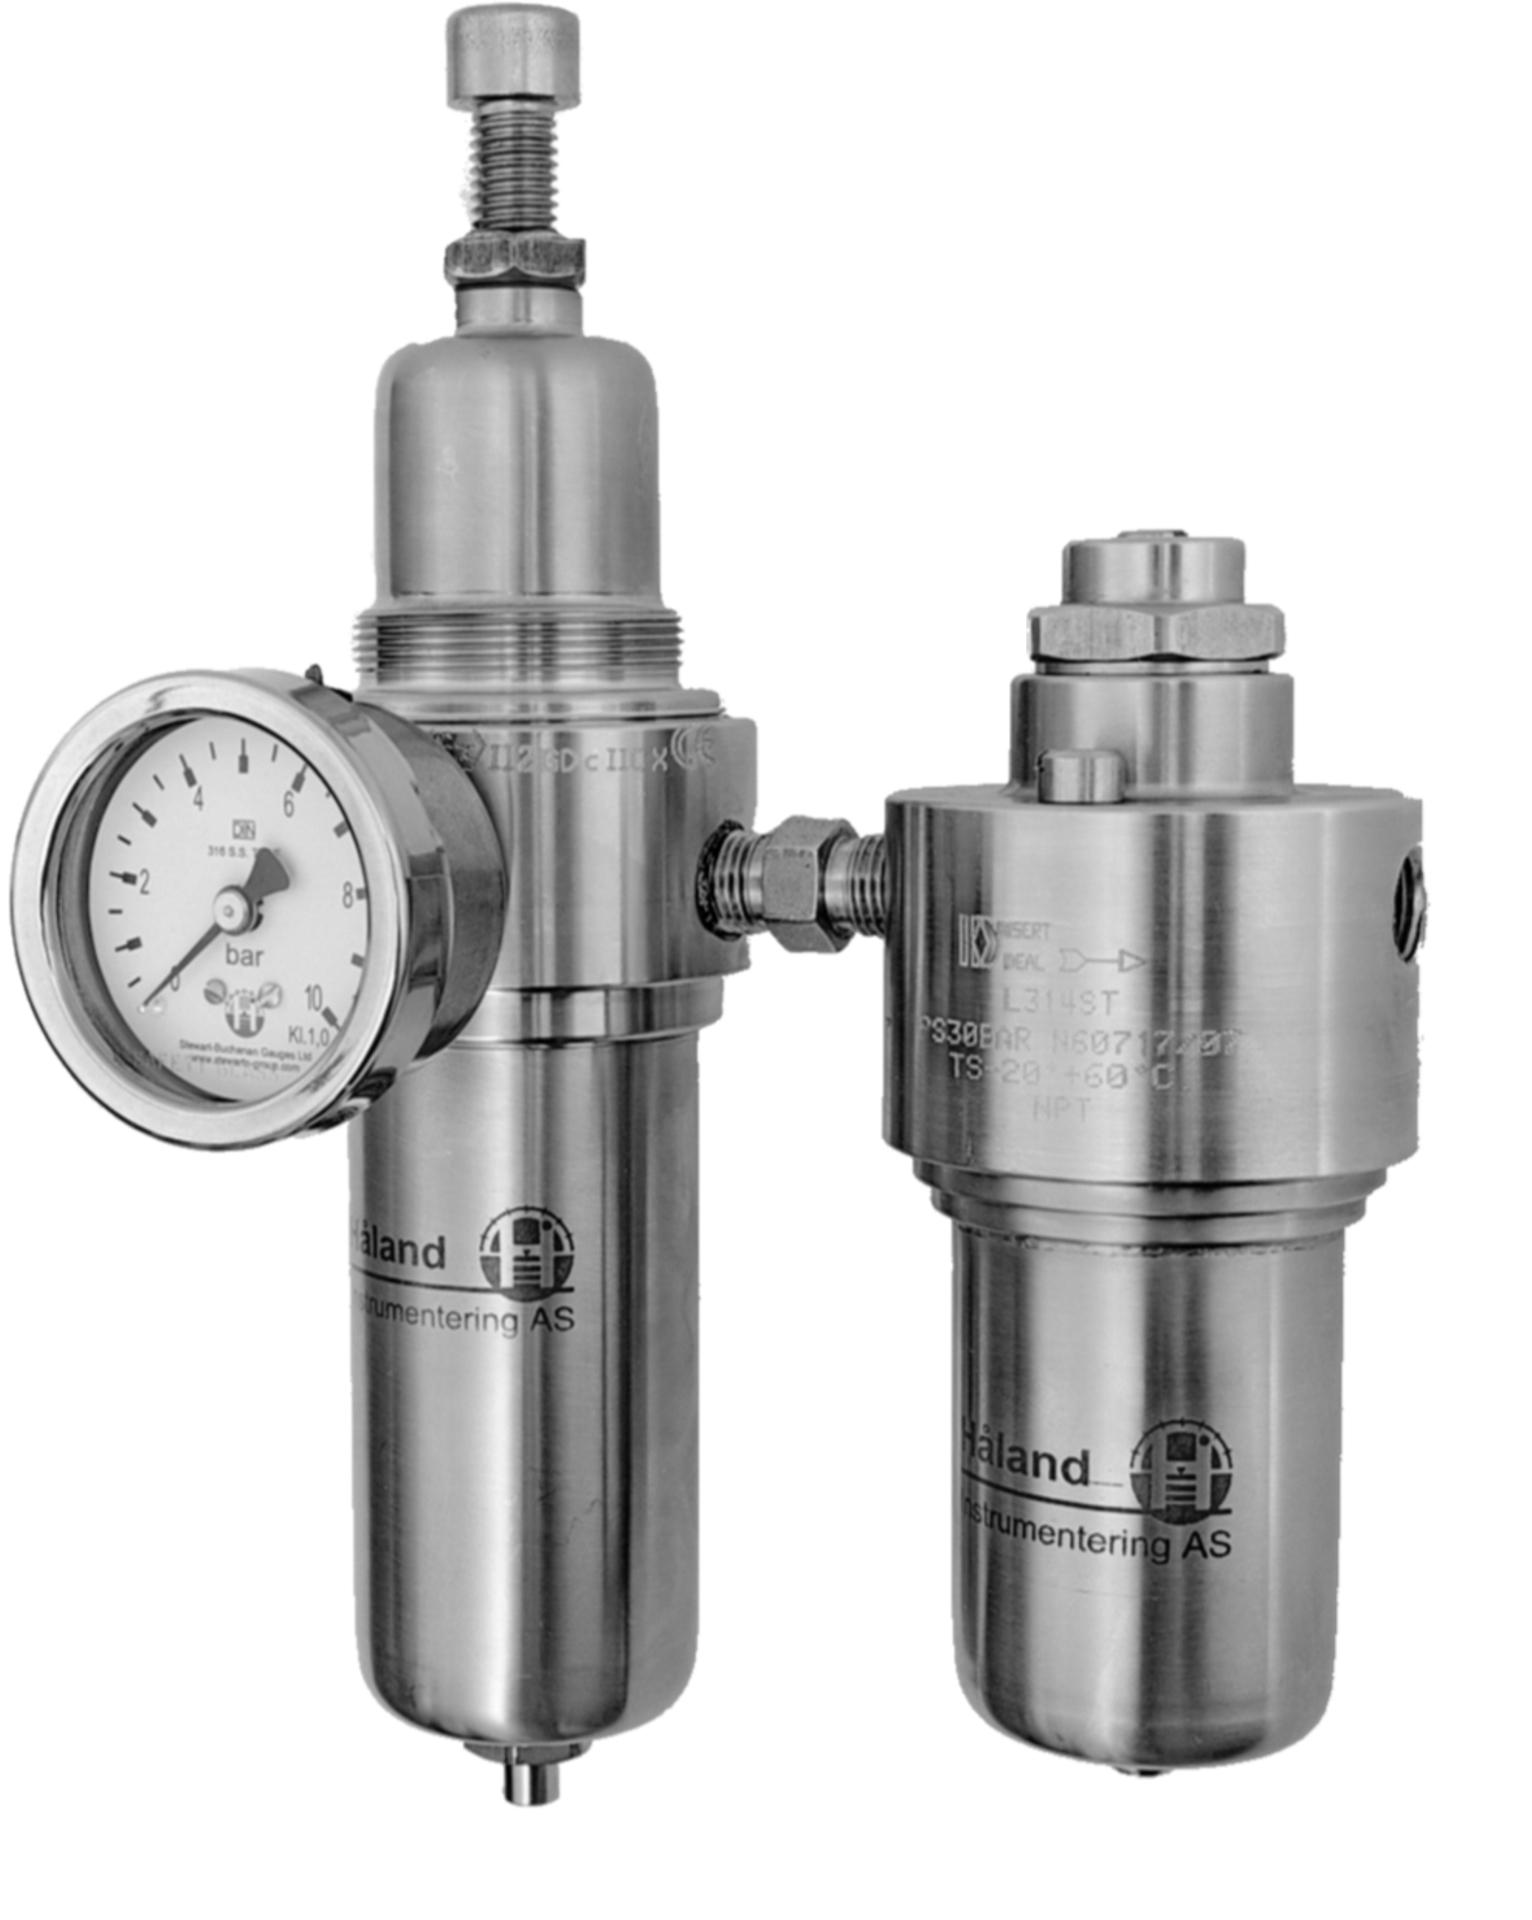 Luftregulator Gassregulator Luft filter regulator manometer tåkesmører pneumatikk 316SS rustfri 0,25in Insert Deal forhandler distributør Norge